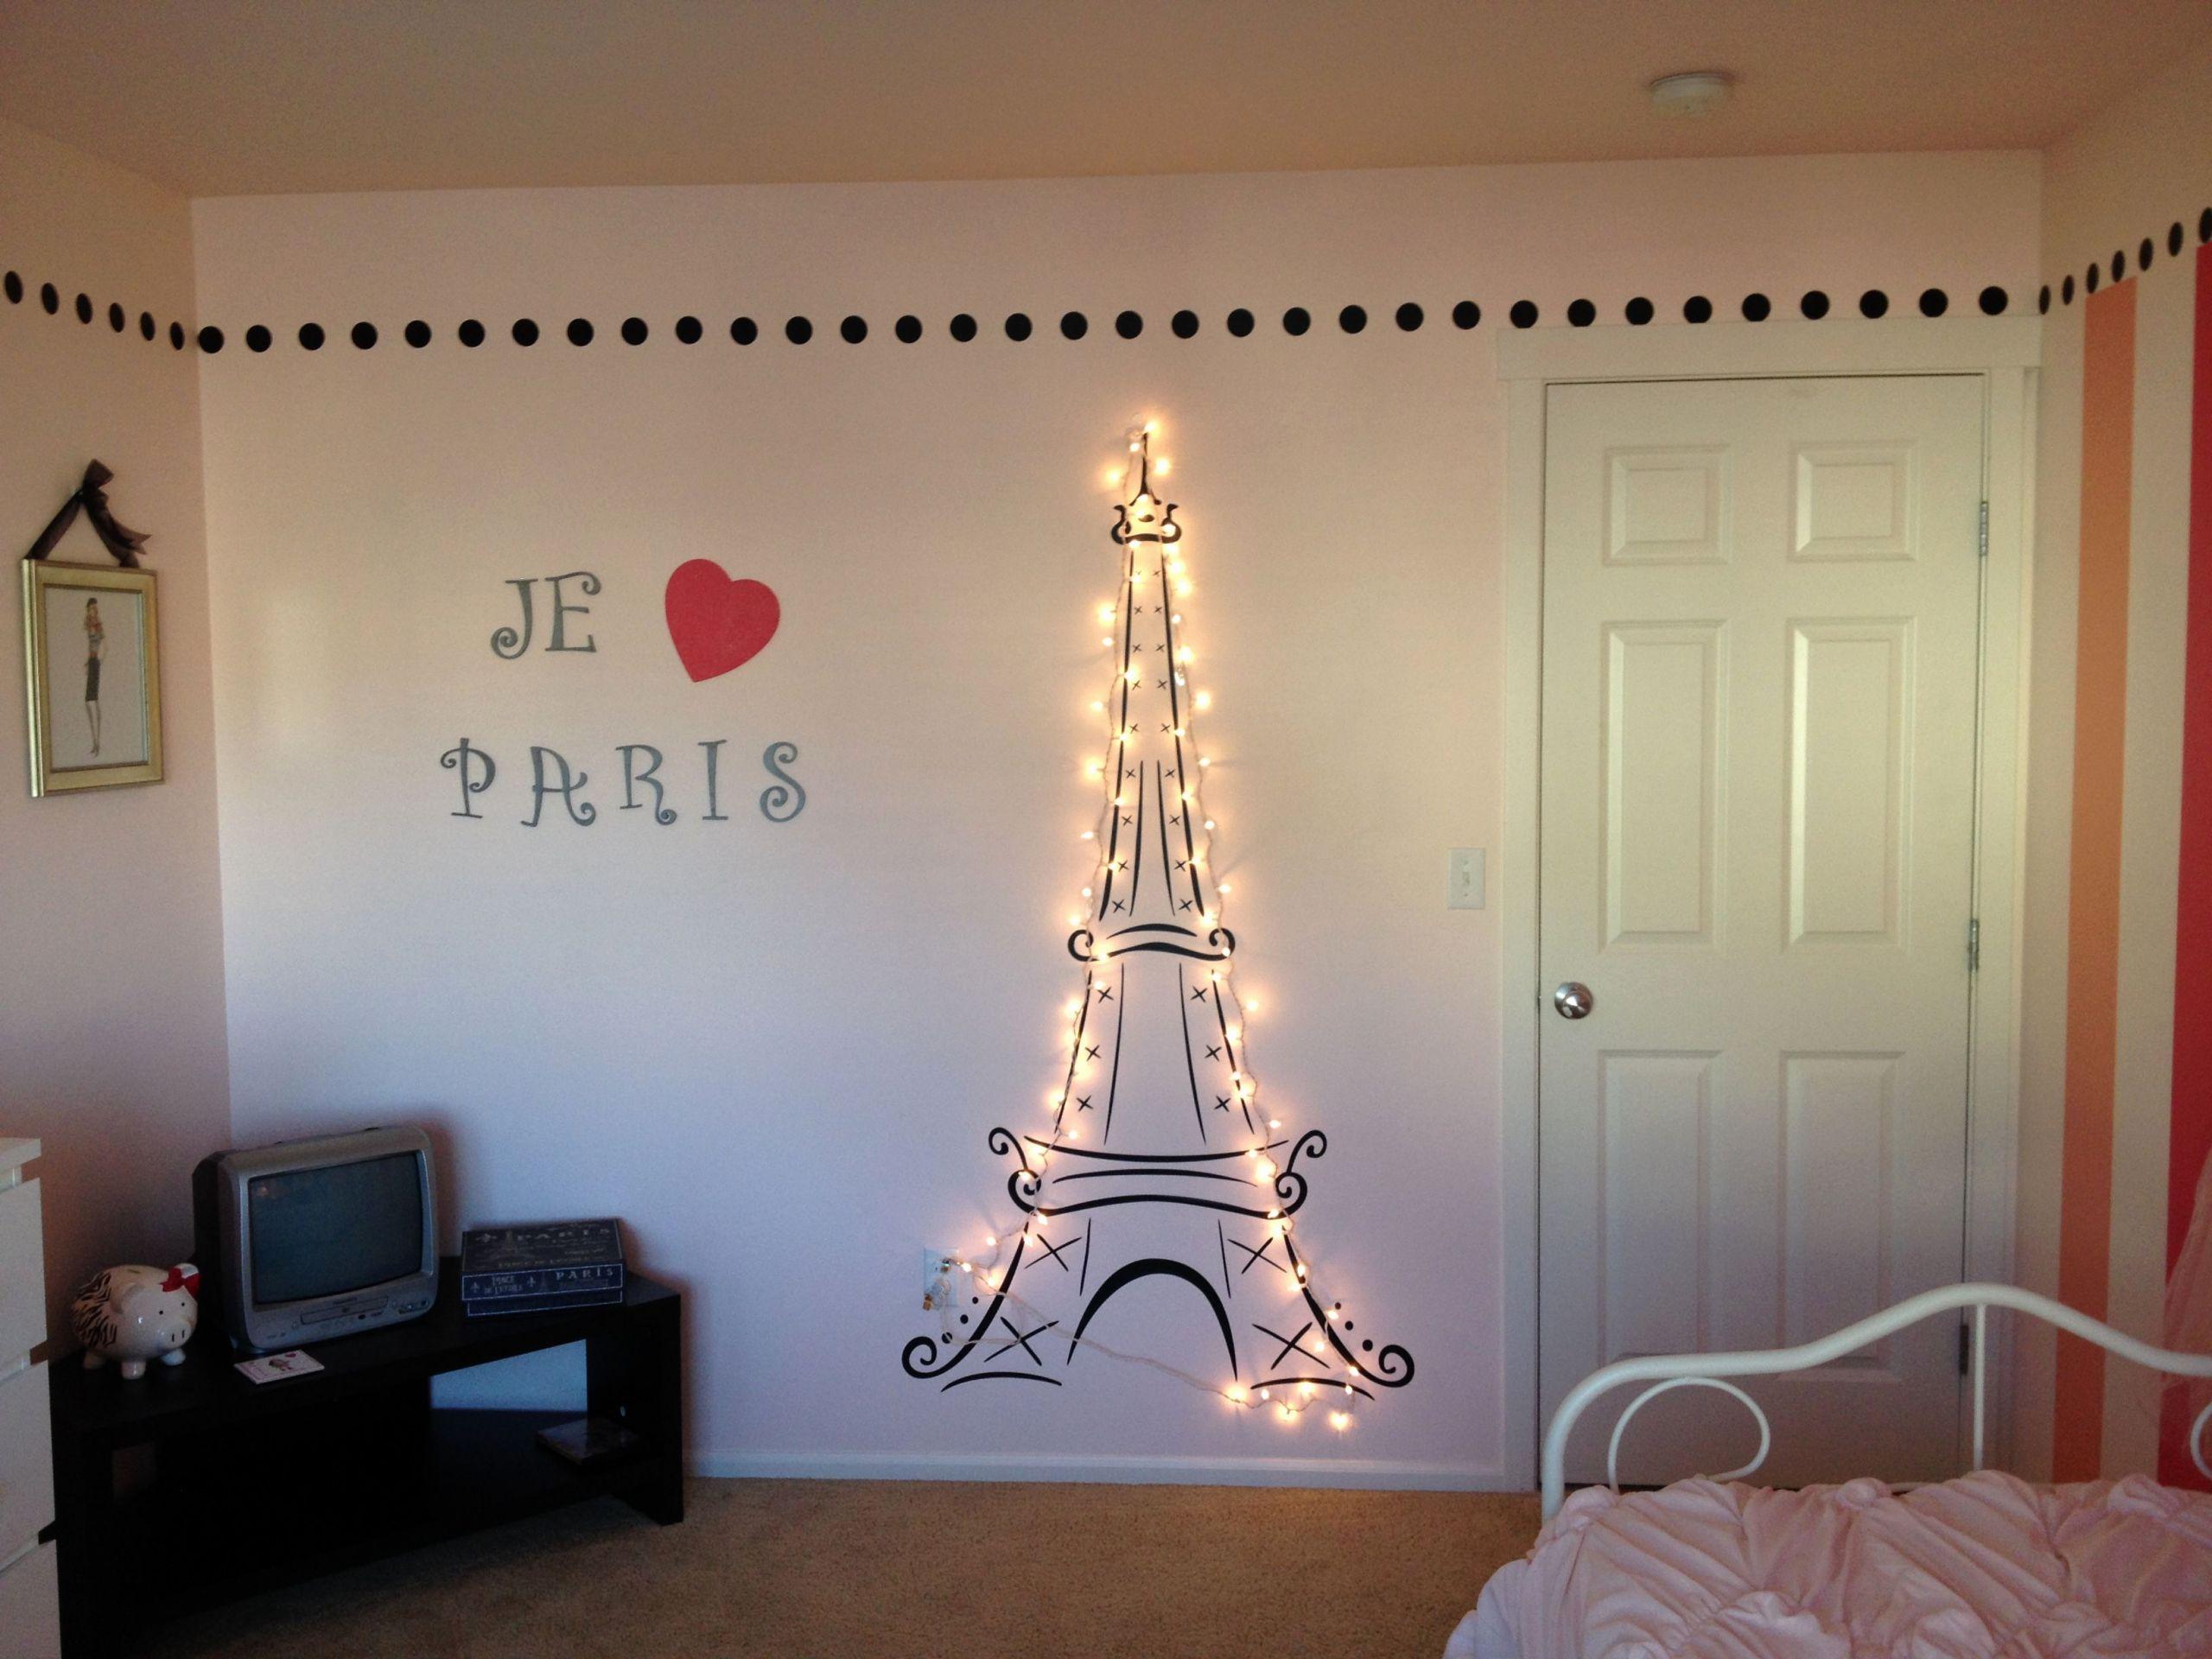 Paris Bedroom Decor Target Fresh Lit Eiffel tower for My Daughter